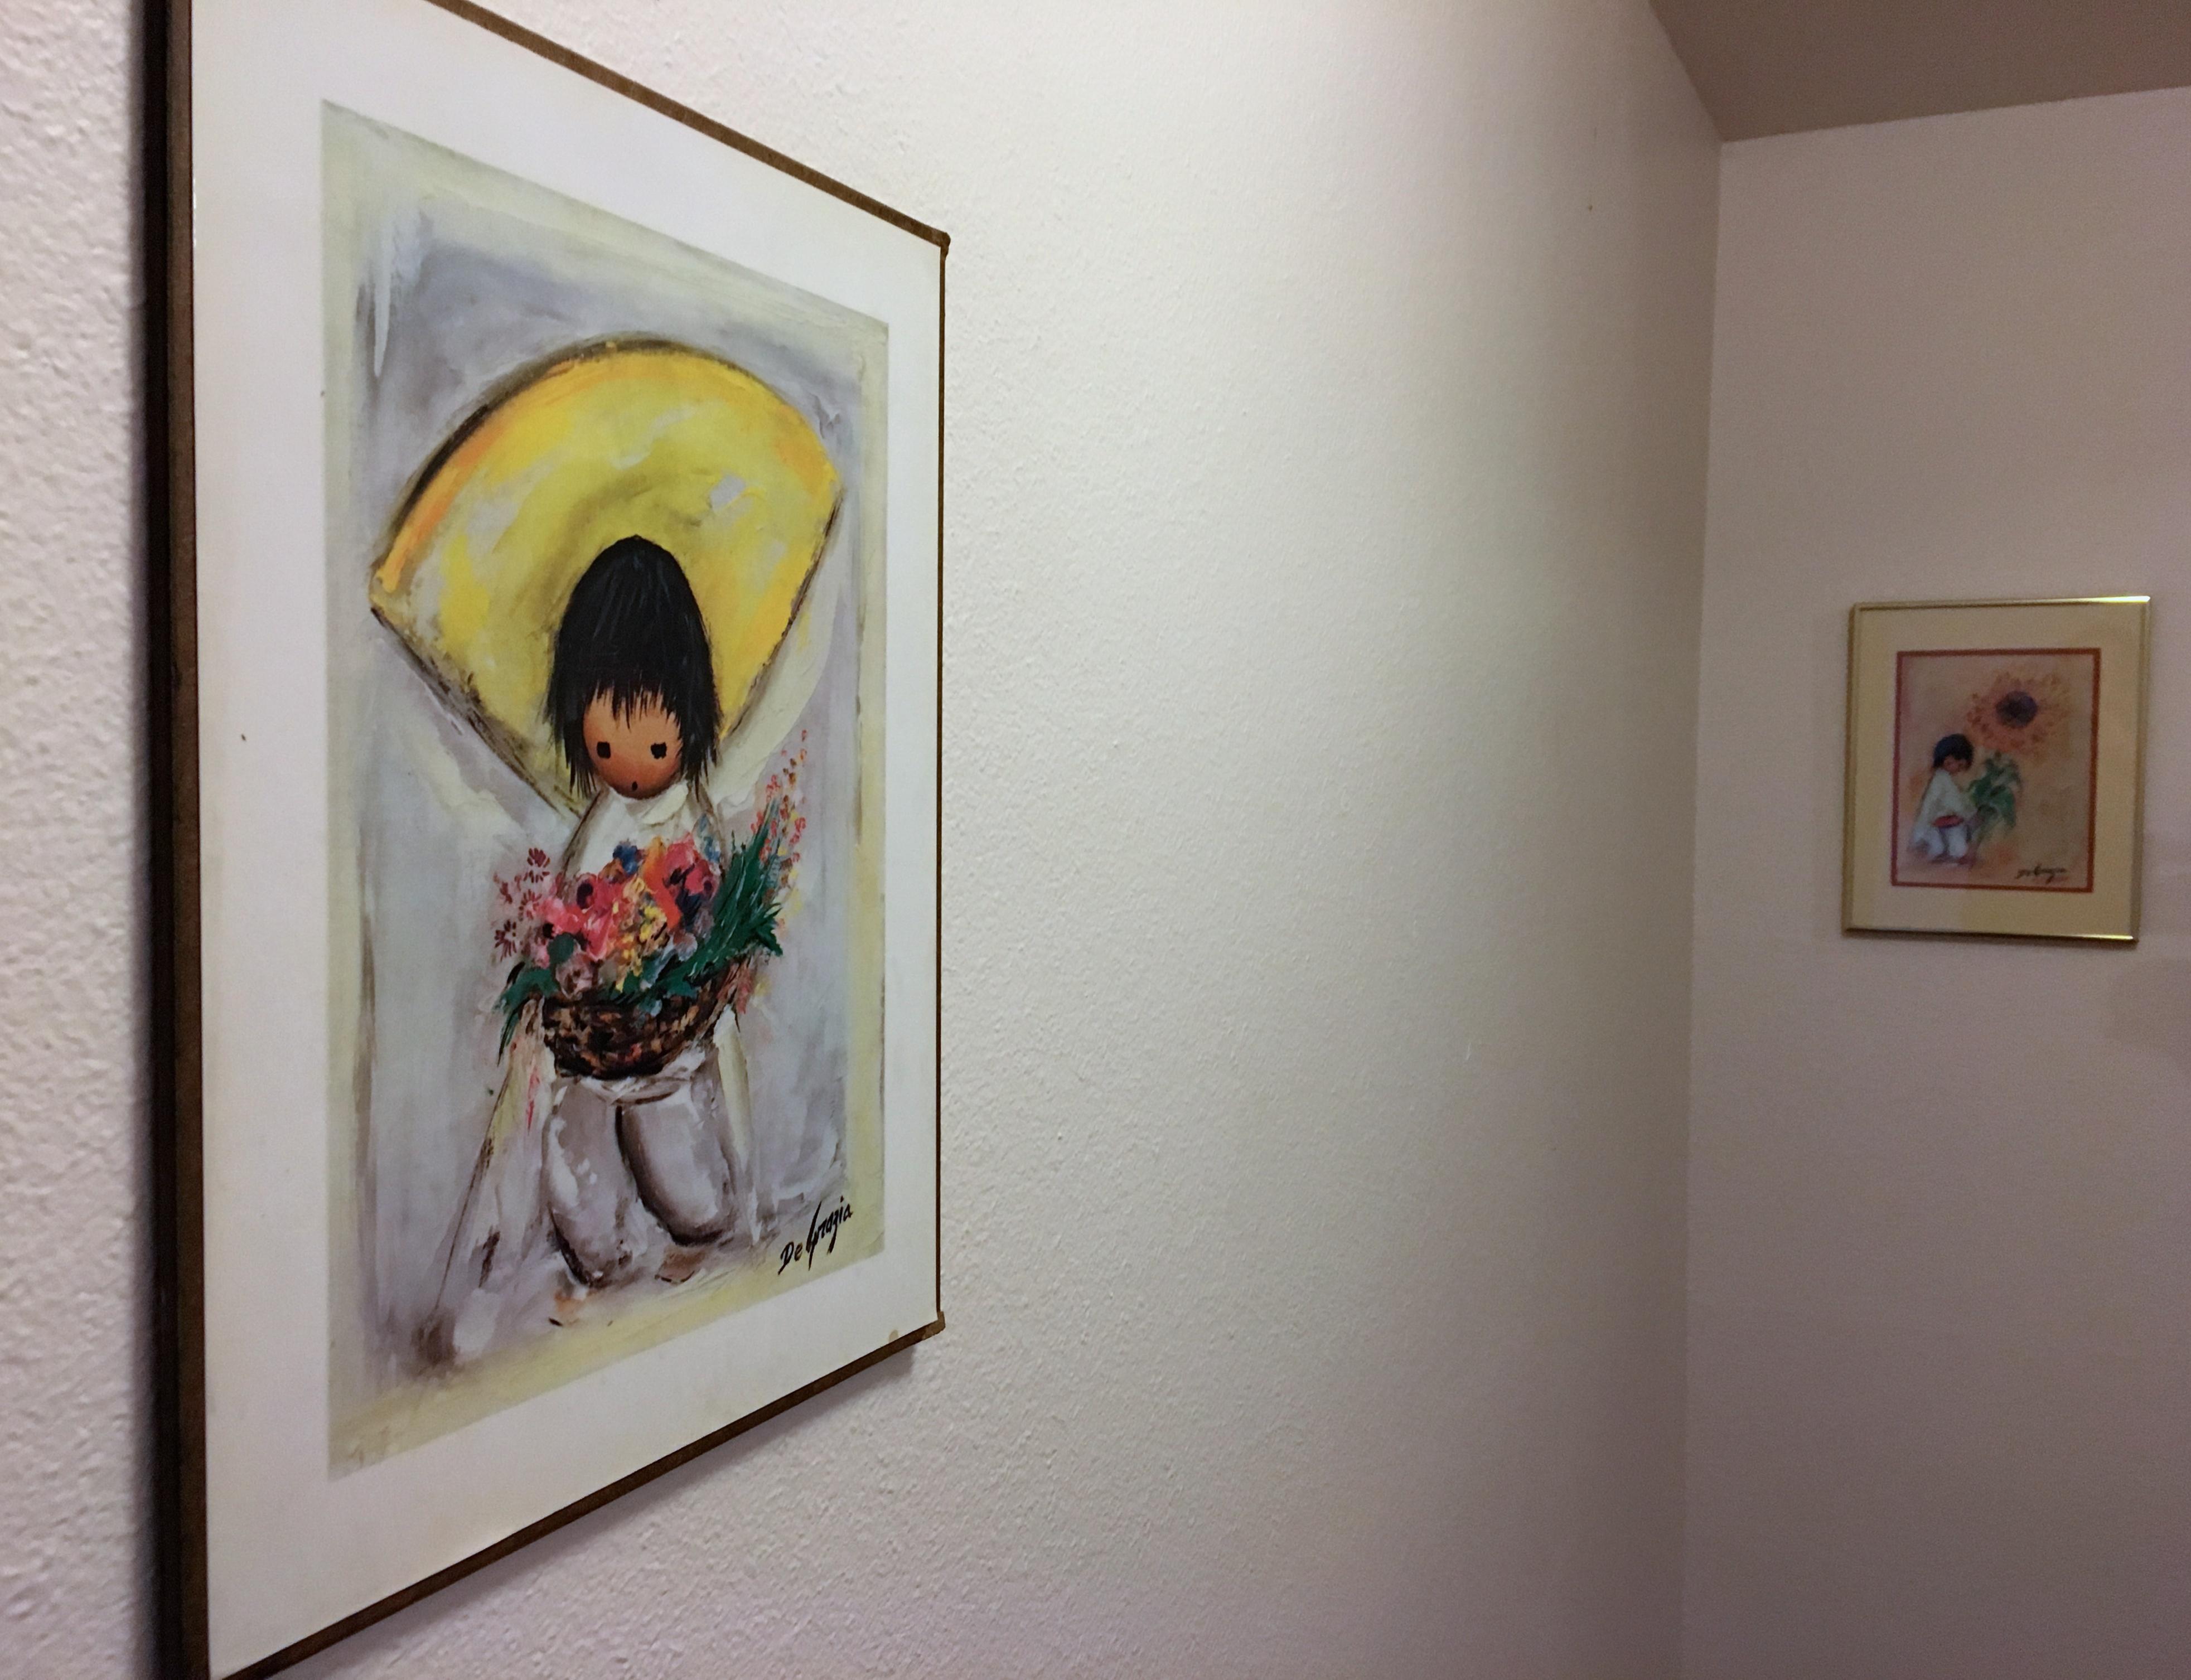 Fotos gratis : pintura, art, dibujo, mural, marco, atracción ...